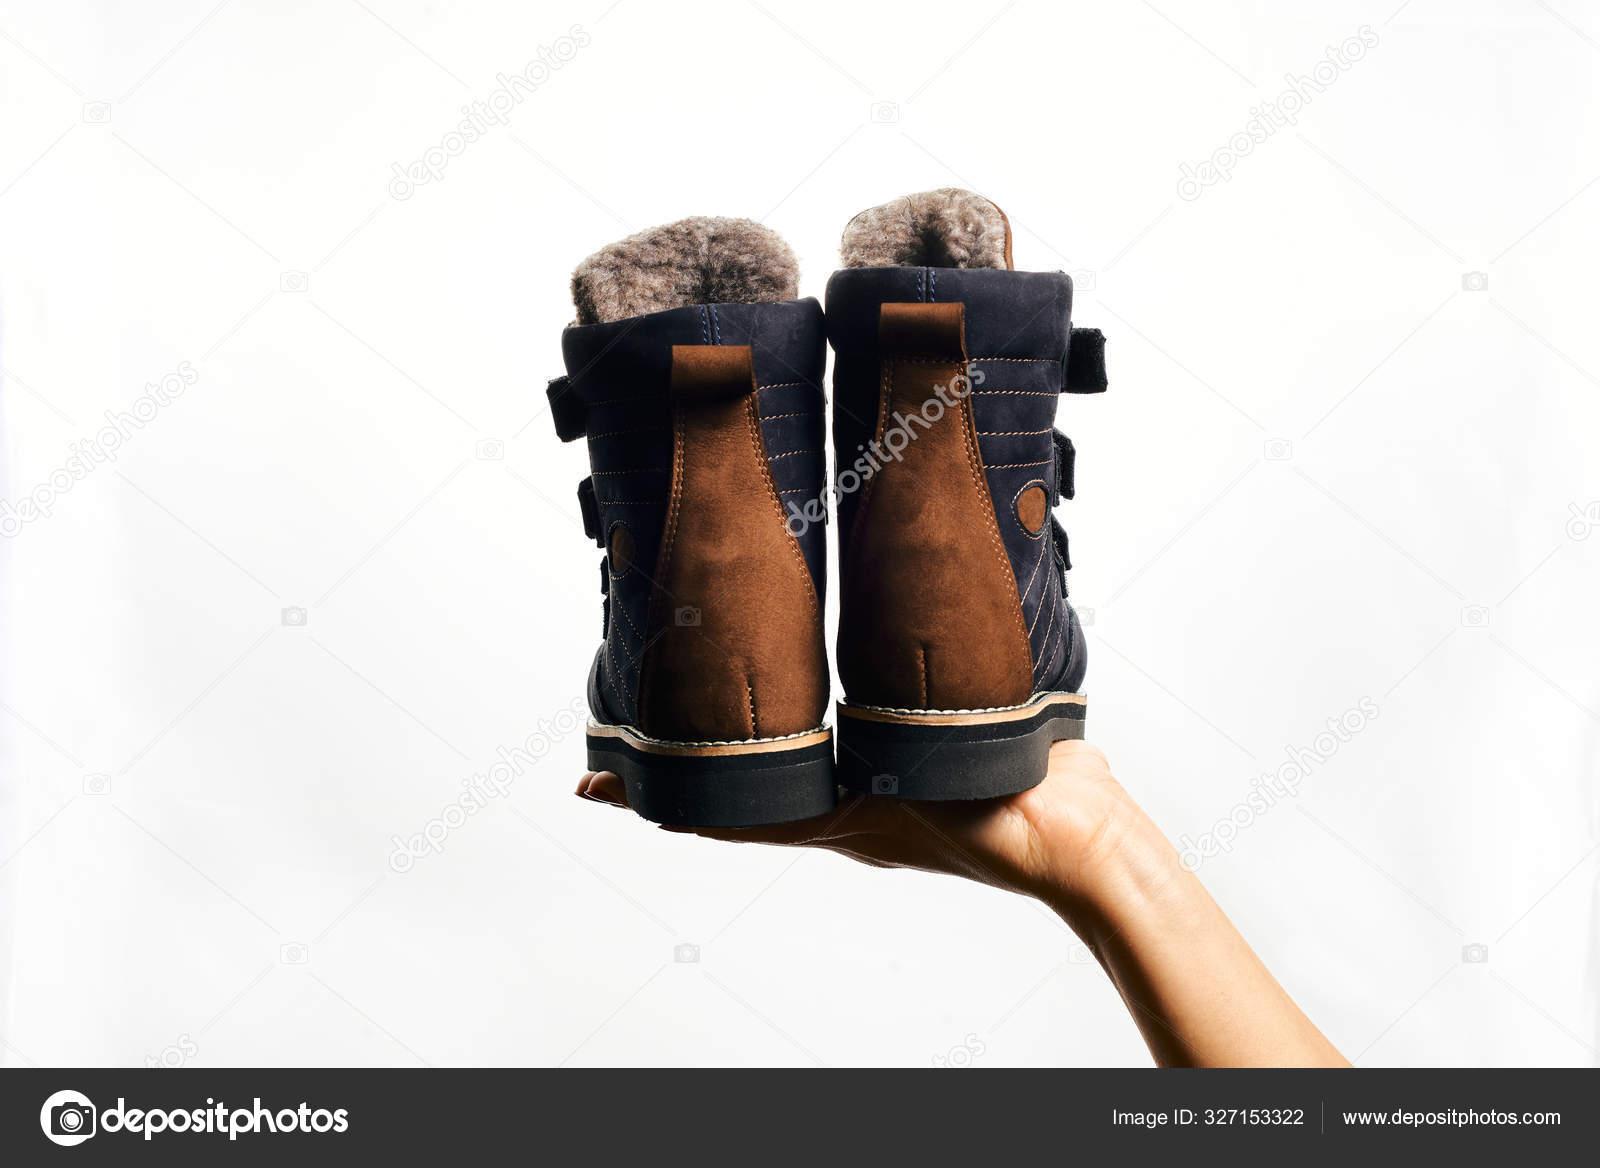 orthopedic winter shoes